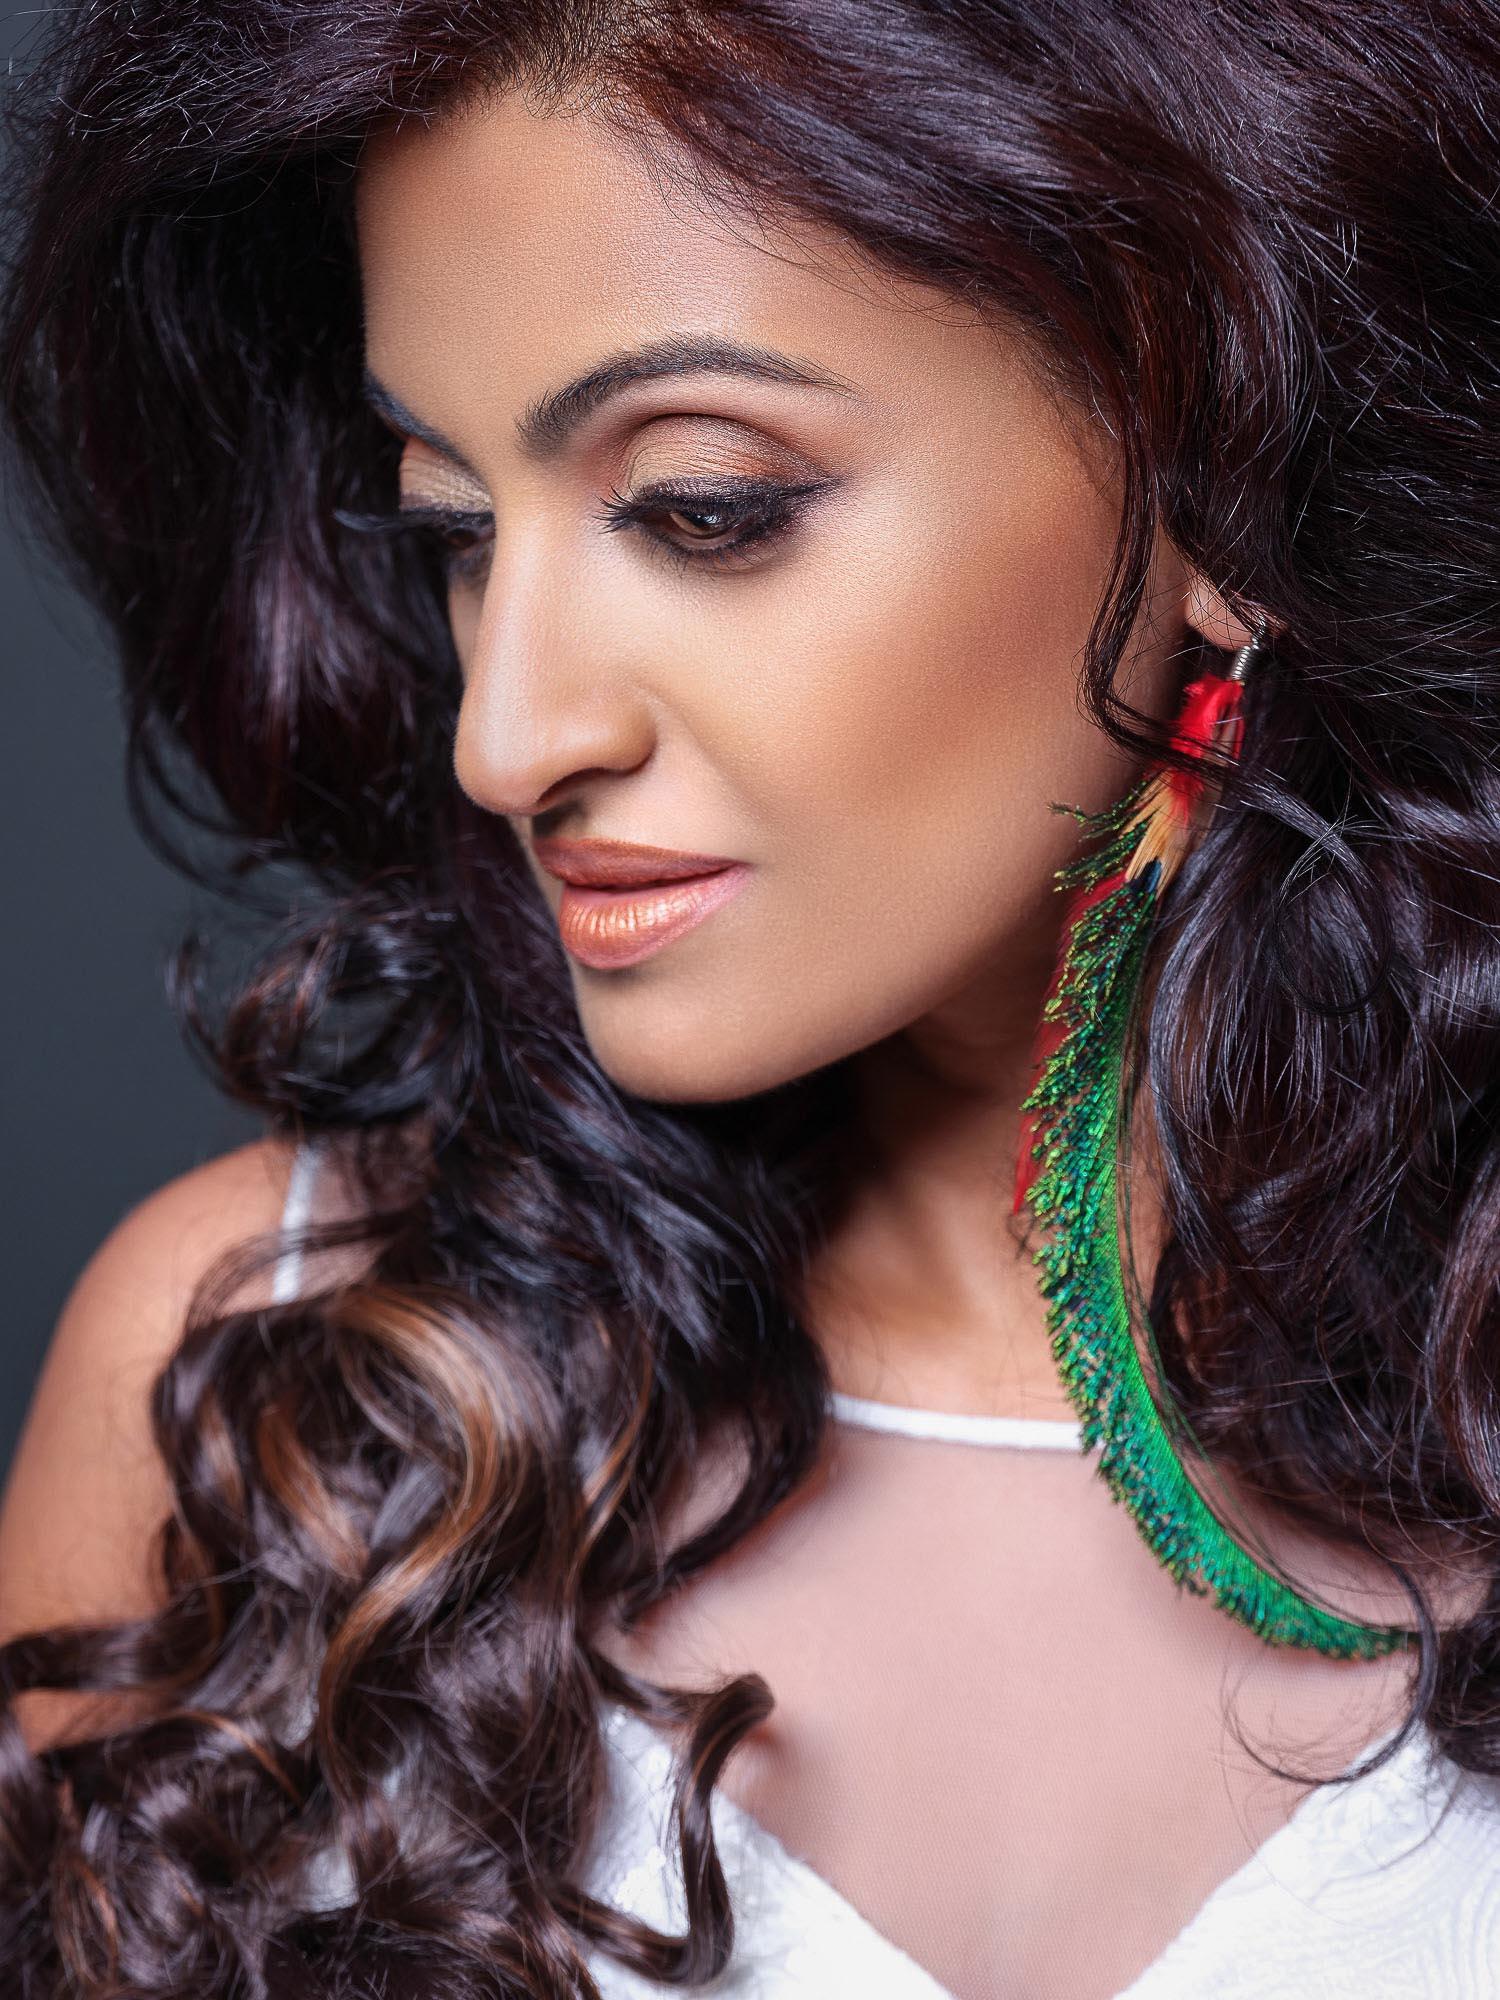 fashion beauty photography photographer model singapore sg mode studio photoshoot style indian india portrait fujifilm gfx 50s 110mm